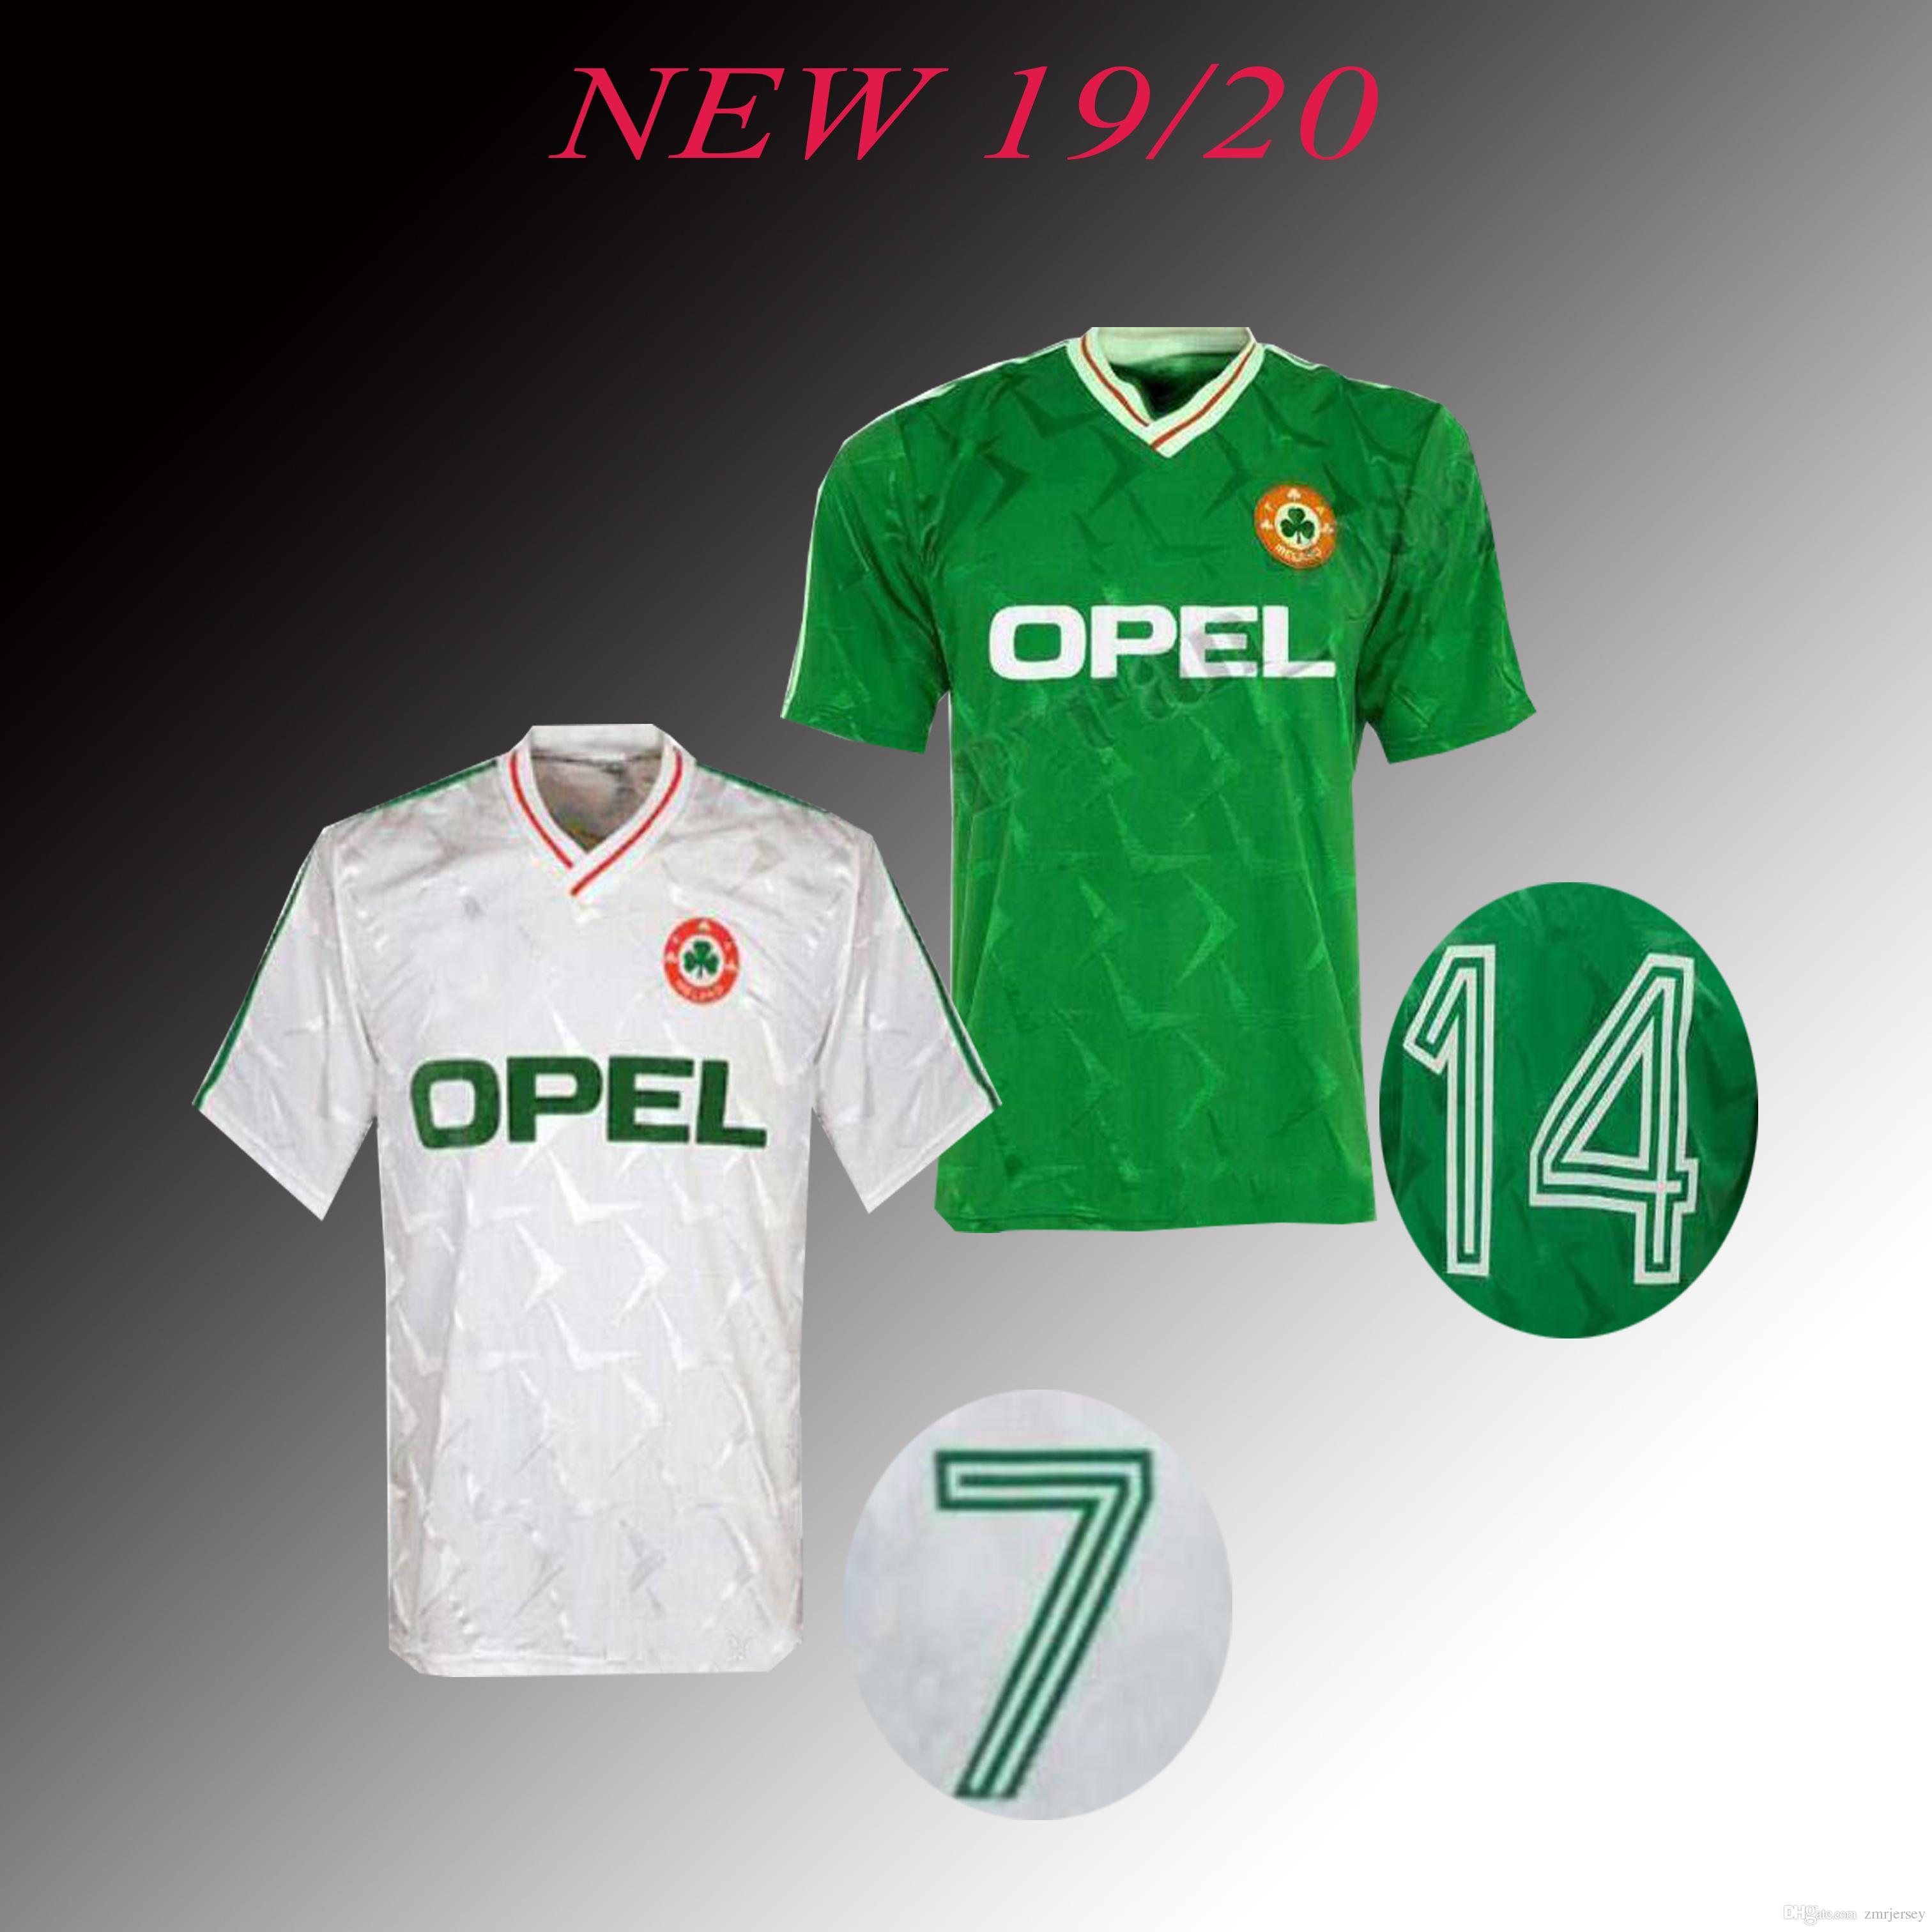 a0c2981cca79 2019 1990 1992 Ireland Retro Soccer Jersey 1990 World Cup Ireland Home  Classic Jersey 90 92 Vintage Irish Sheedy Football Shirts.